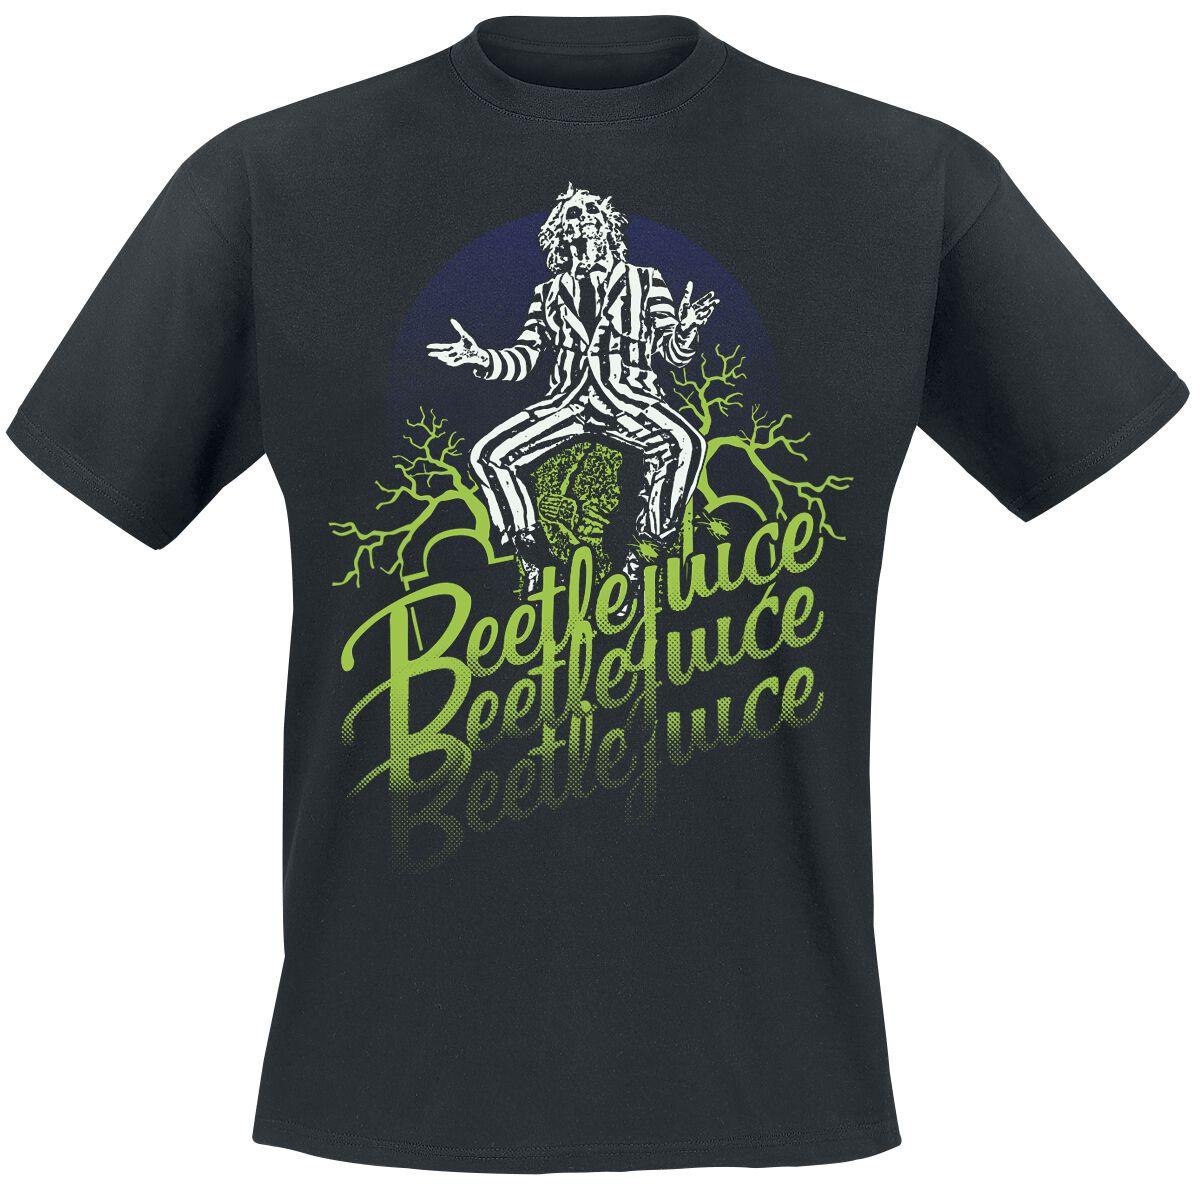 Merch dla Fanów - Koszulki - T-Shirt Beetlejuice Faded T-Shirt czarny - 371797